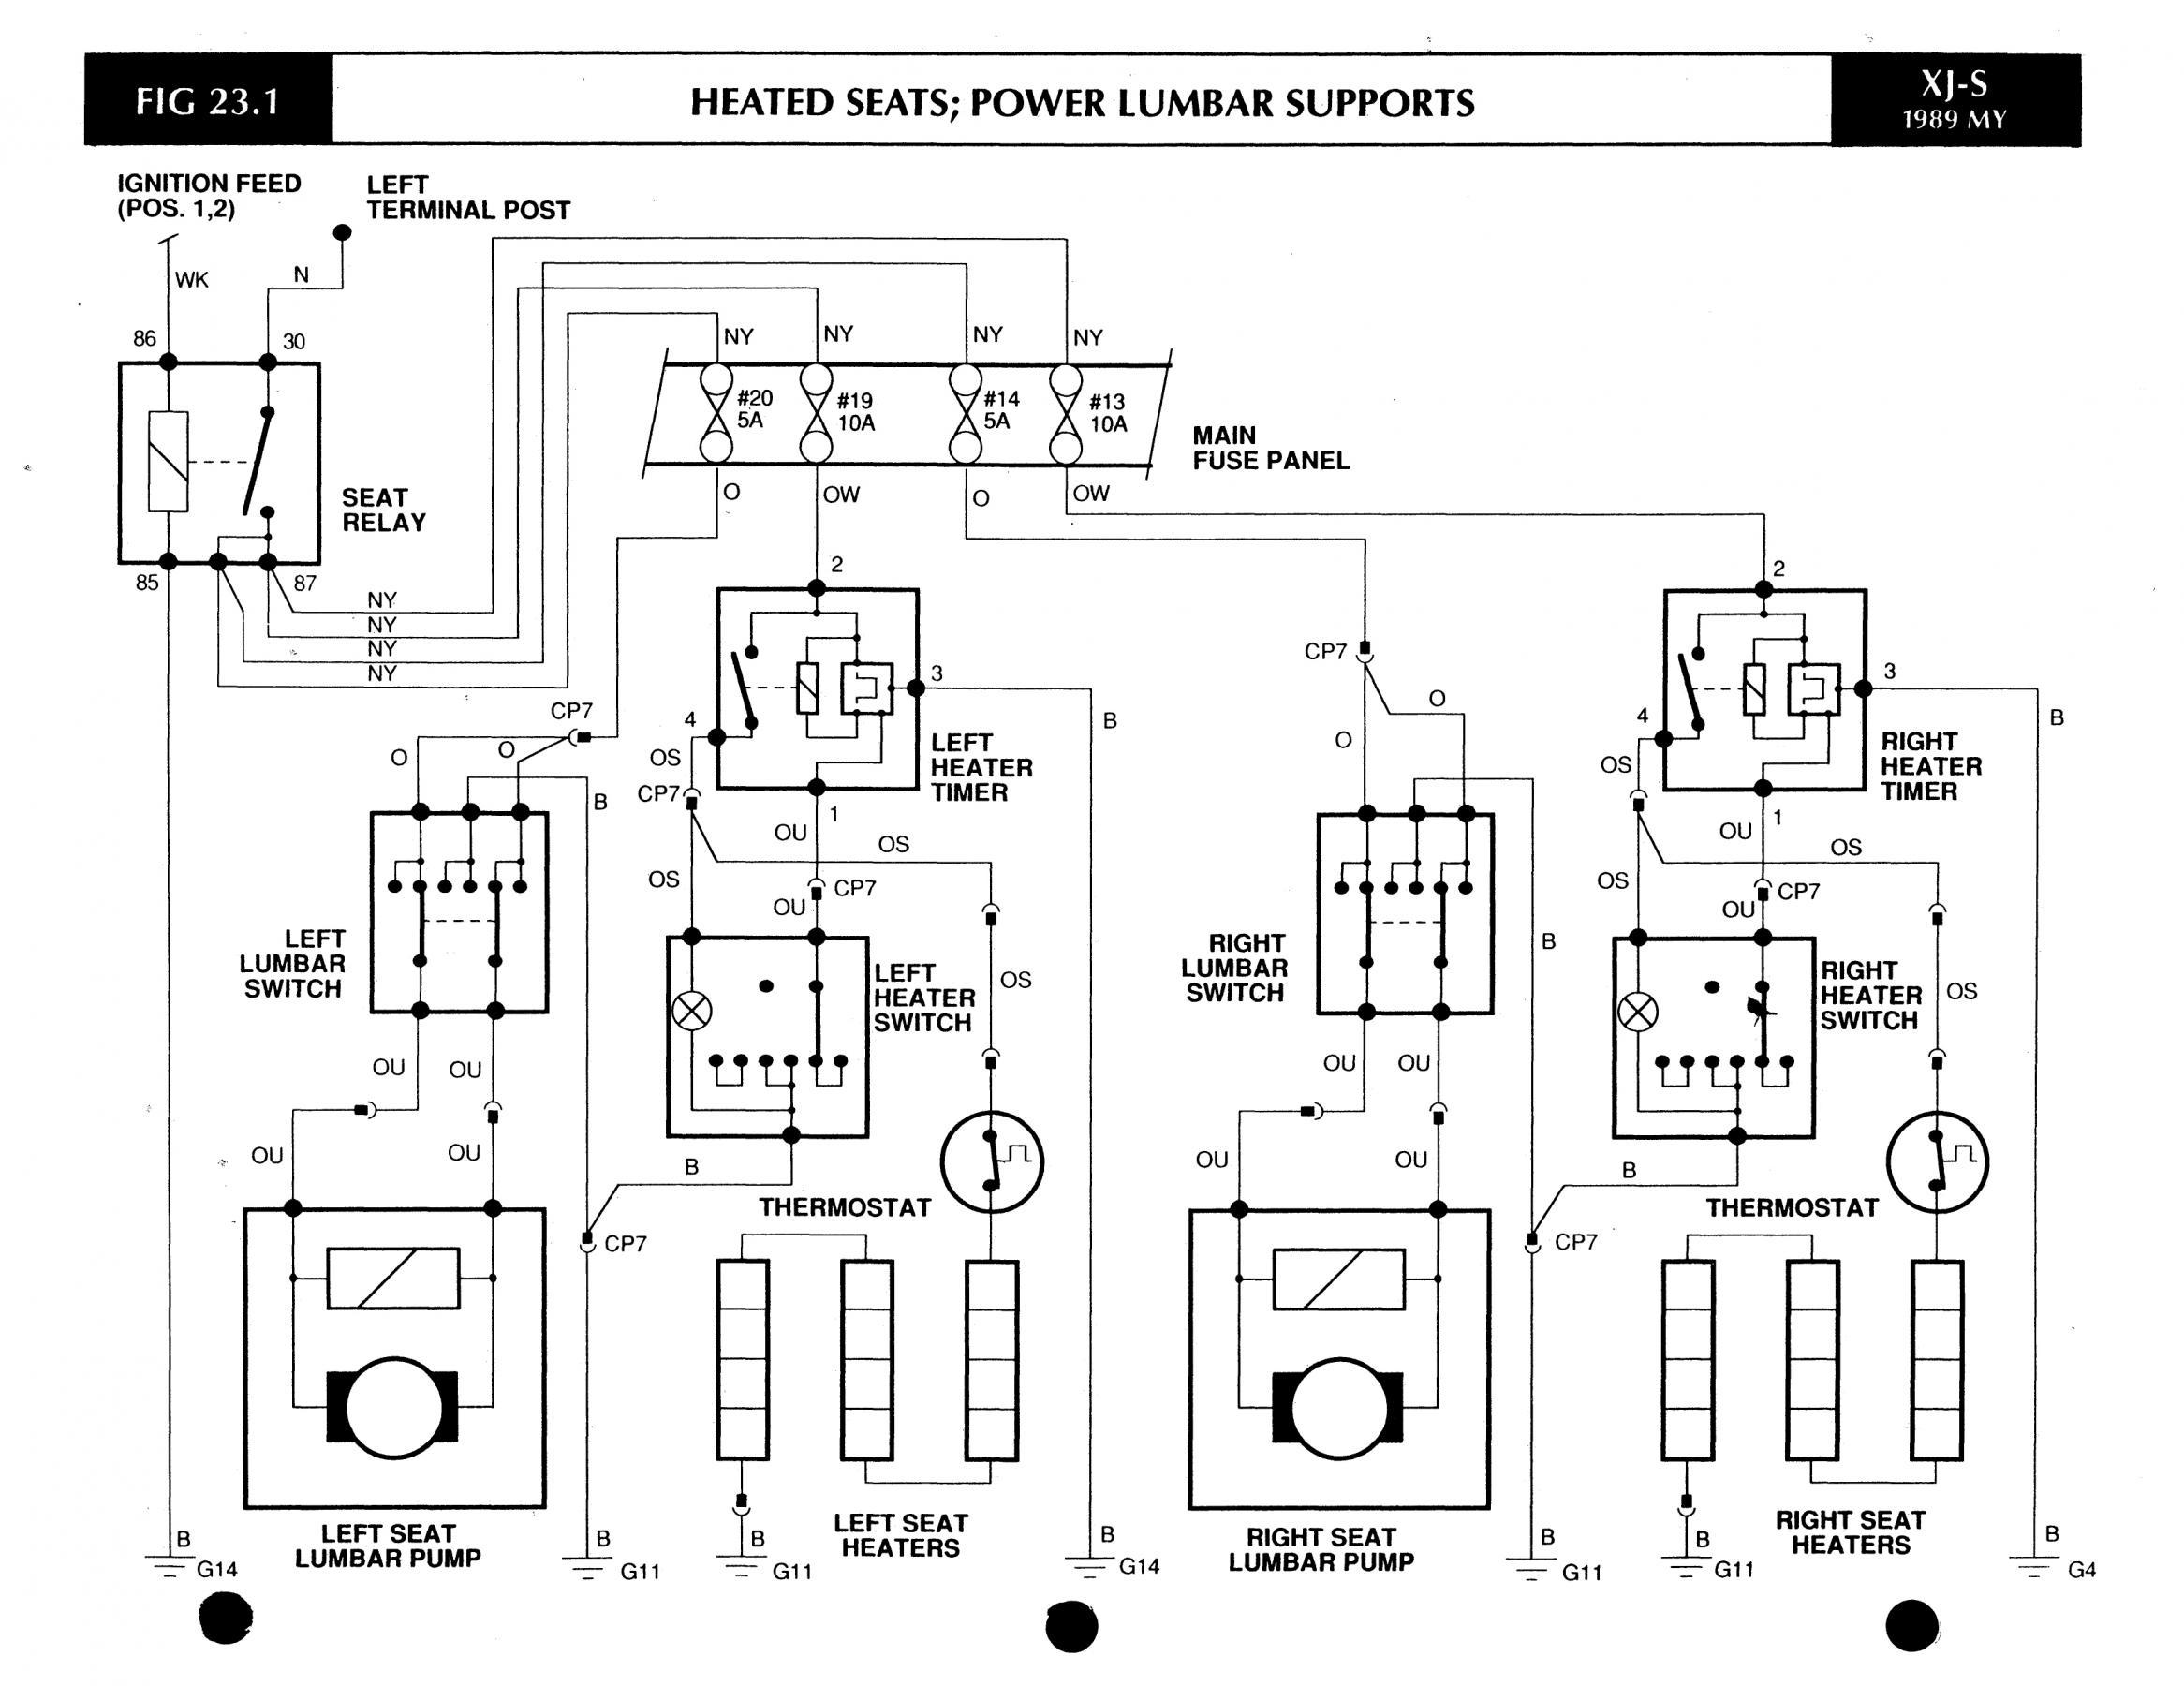 2005 Silverado Heated Seat Wiring Diagram - Wiring Diagrams List on